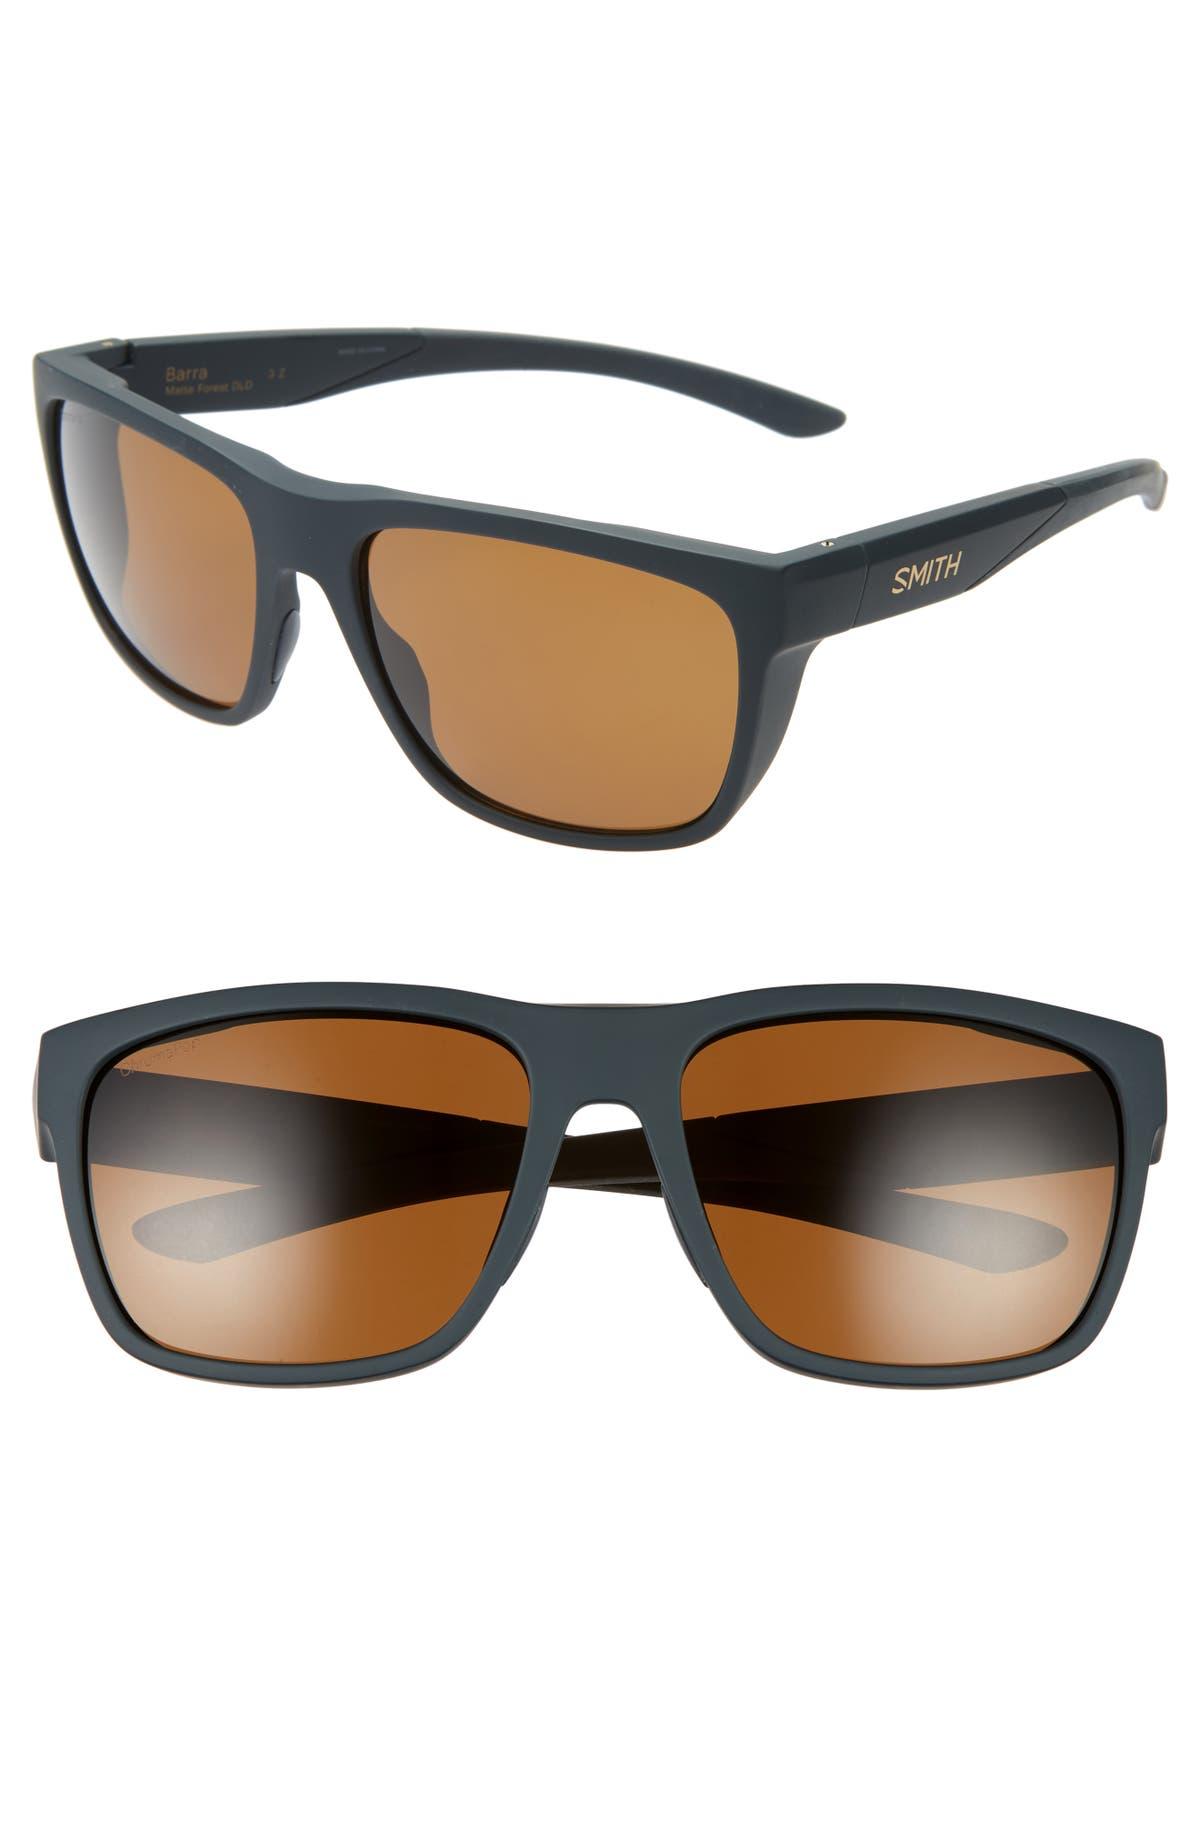 91ceef9234 Smith Bauhaus 59mm ChromaPop™ Polarized Sunglasses